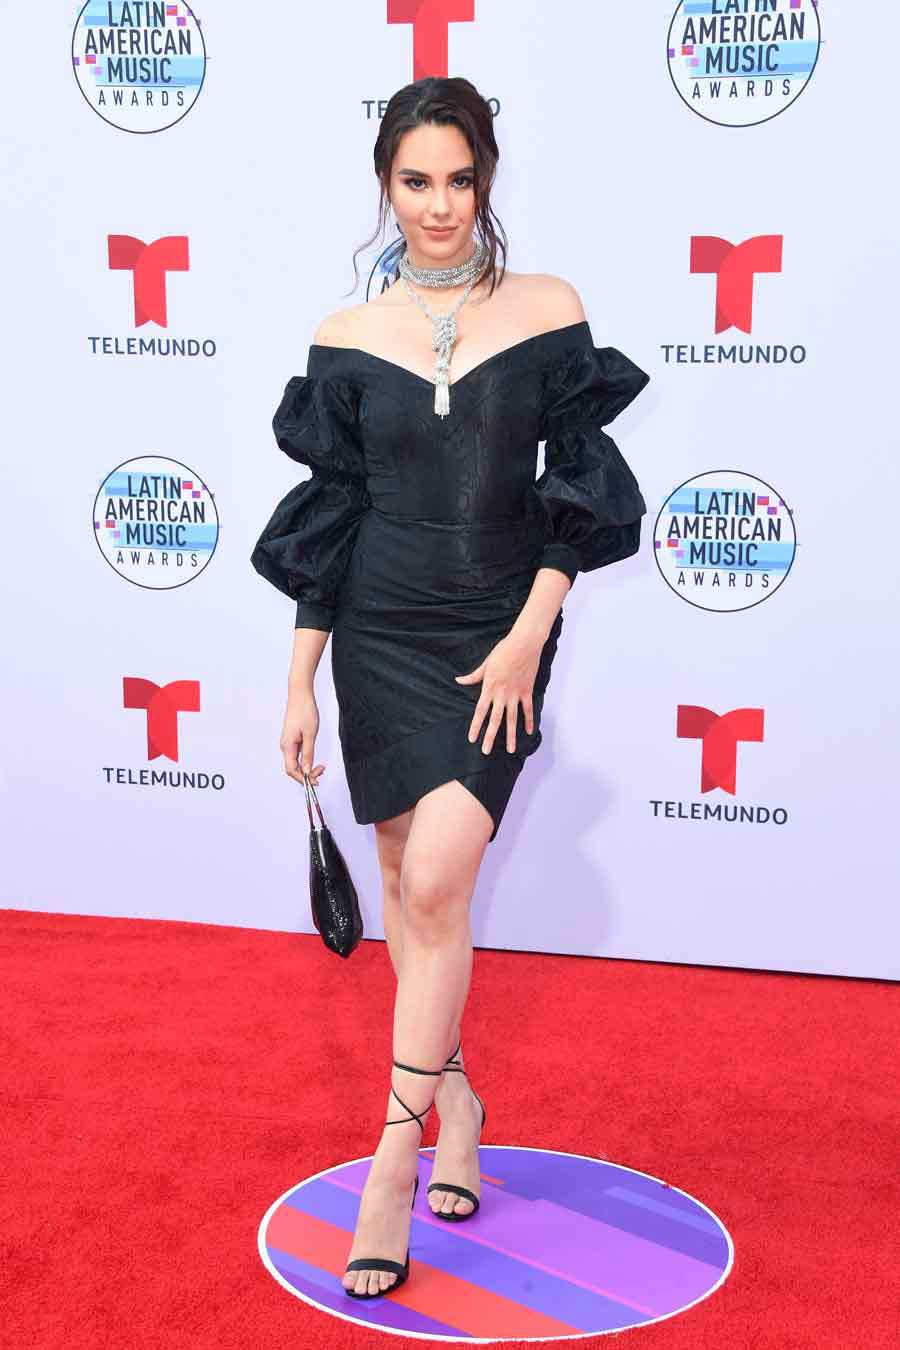 2019 Latin American Music Awards - Arrivals